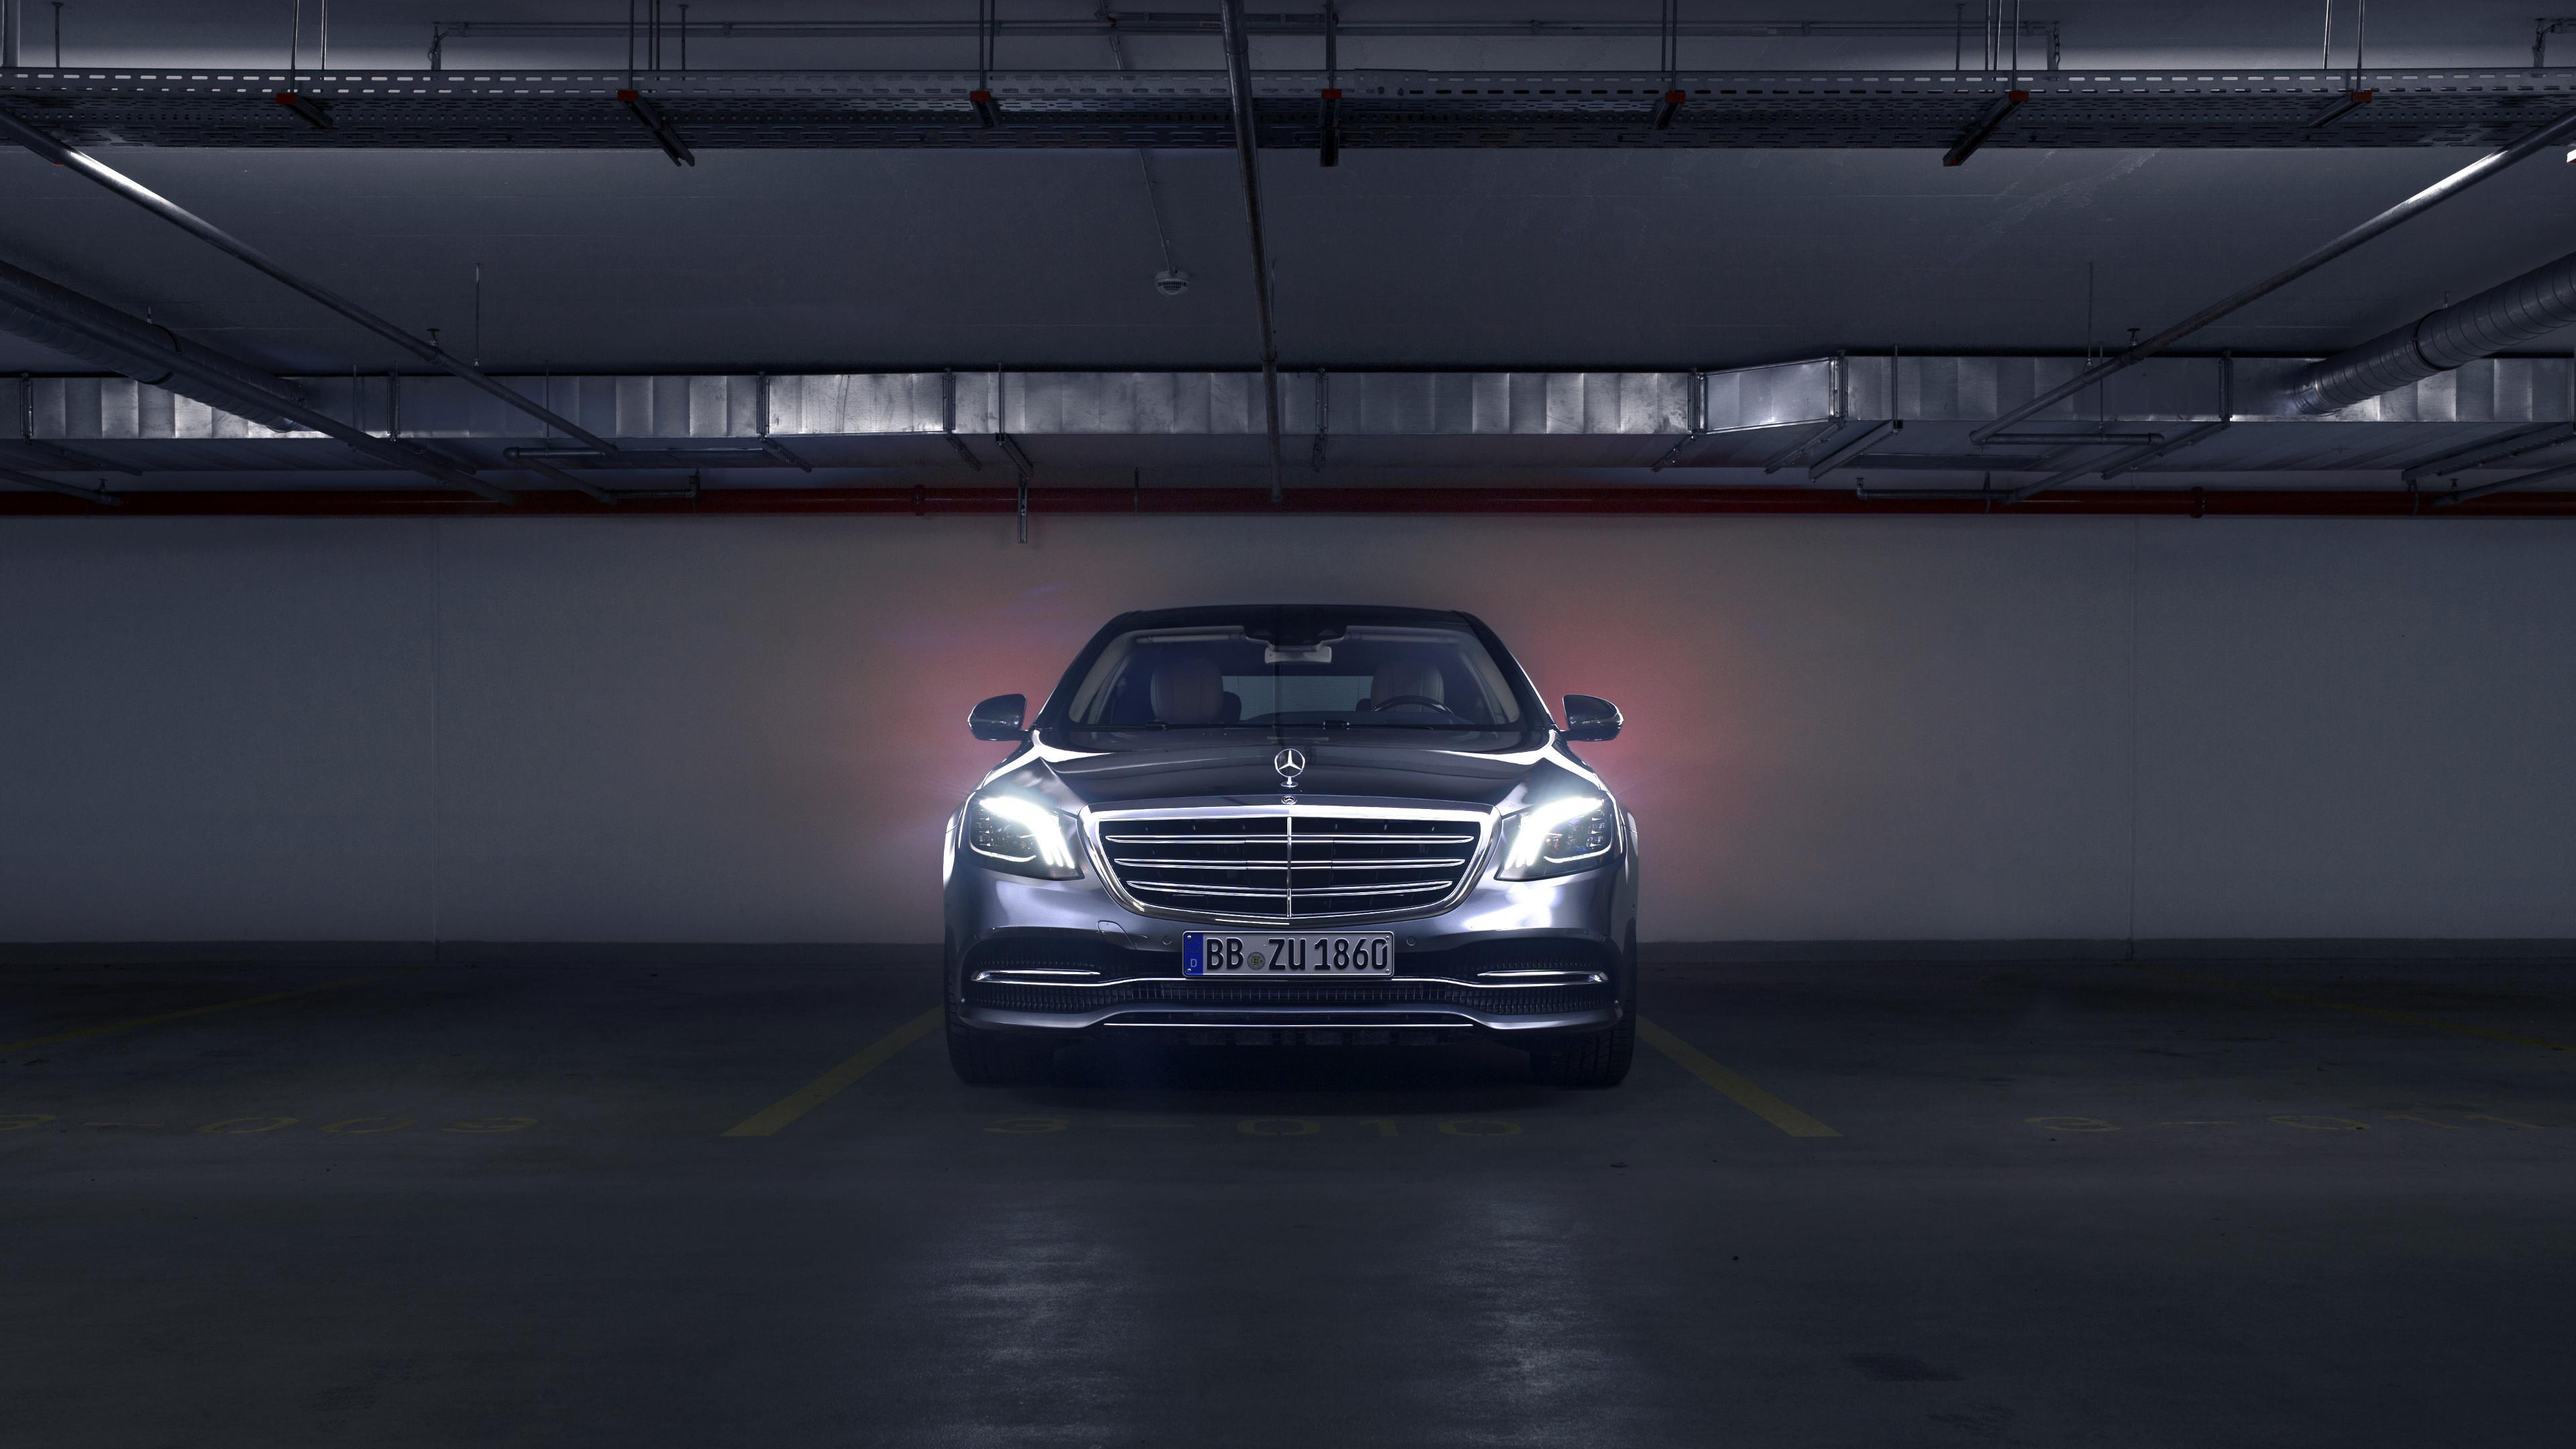 Mercedes Benz Wallpapers Top Free Mercedes Benz